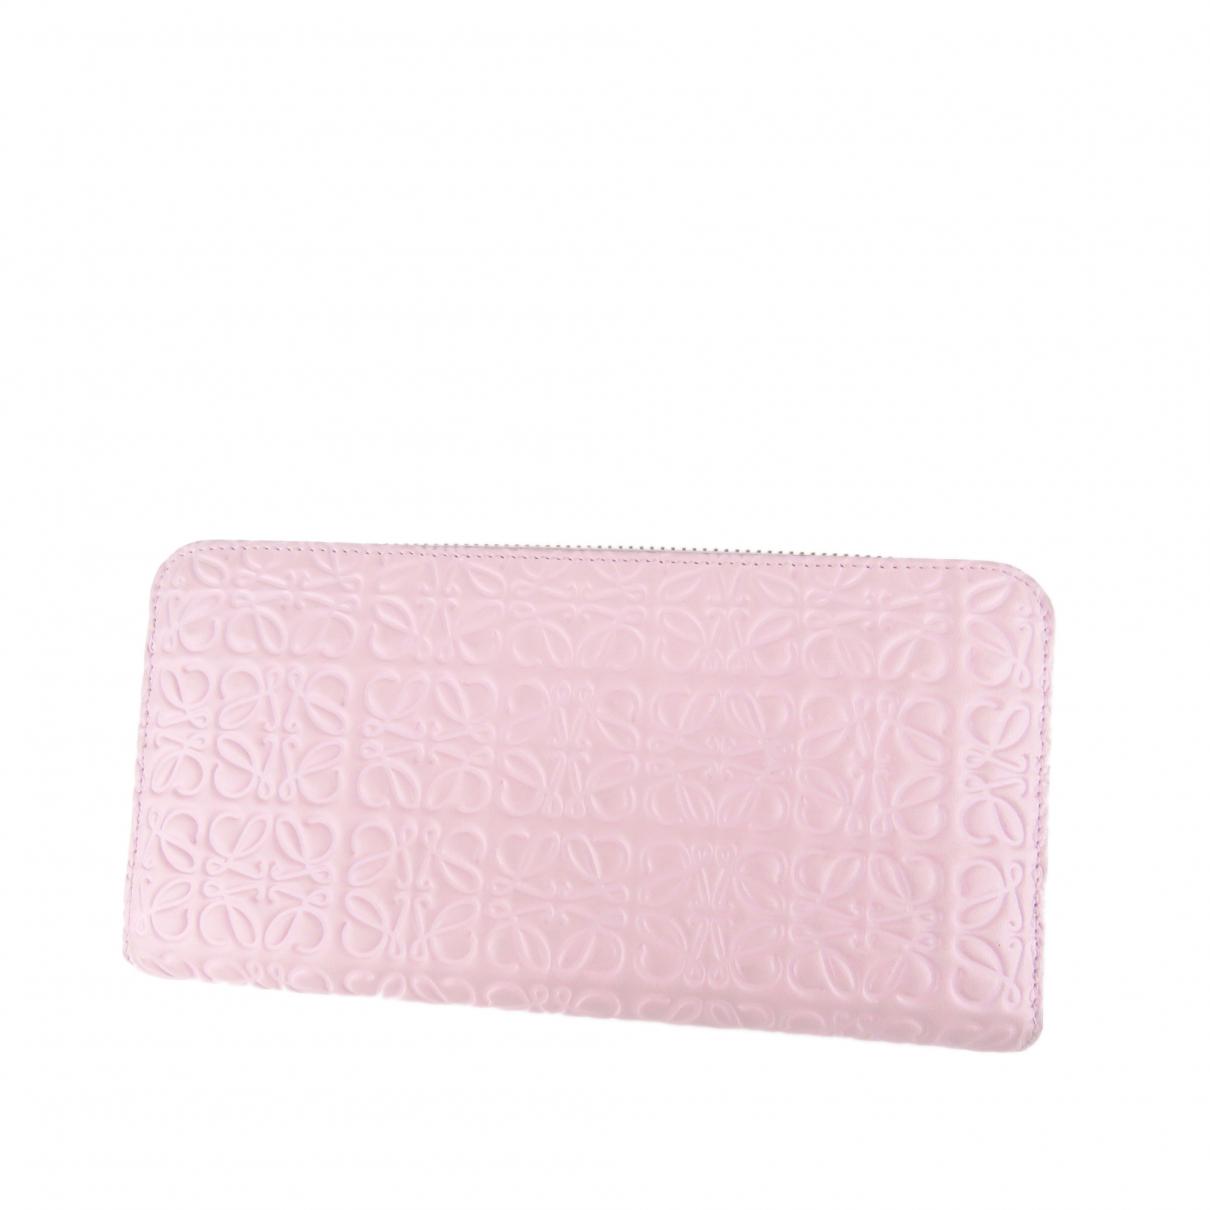 Loewe - Portefeuille   pour femme en cuir - rose